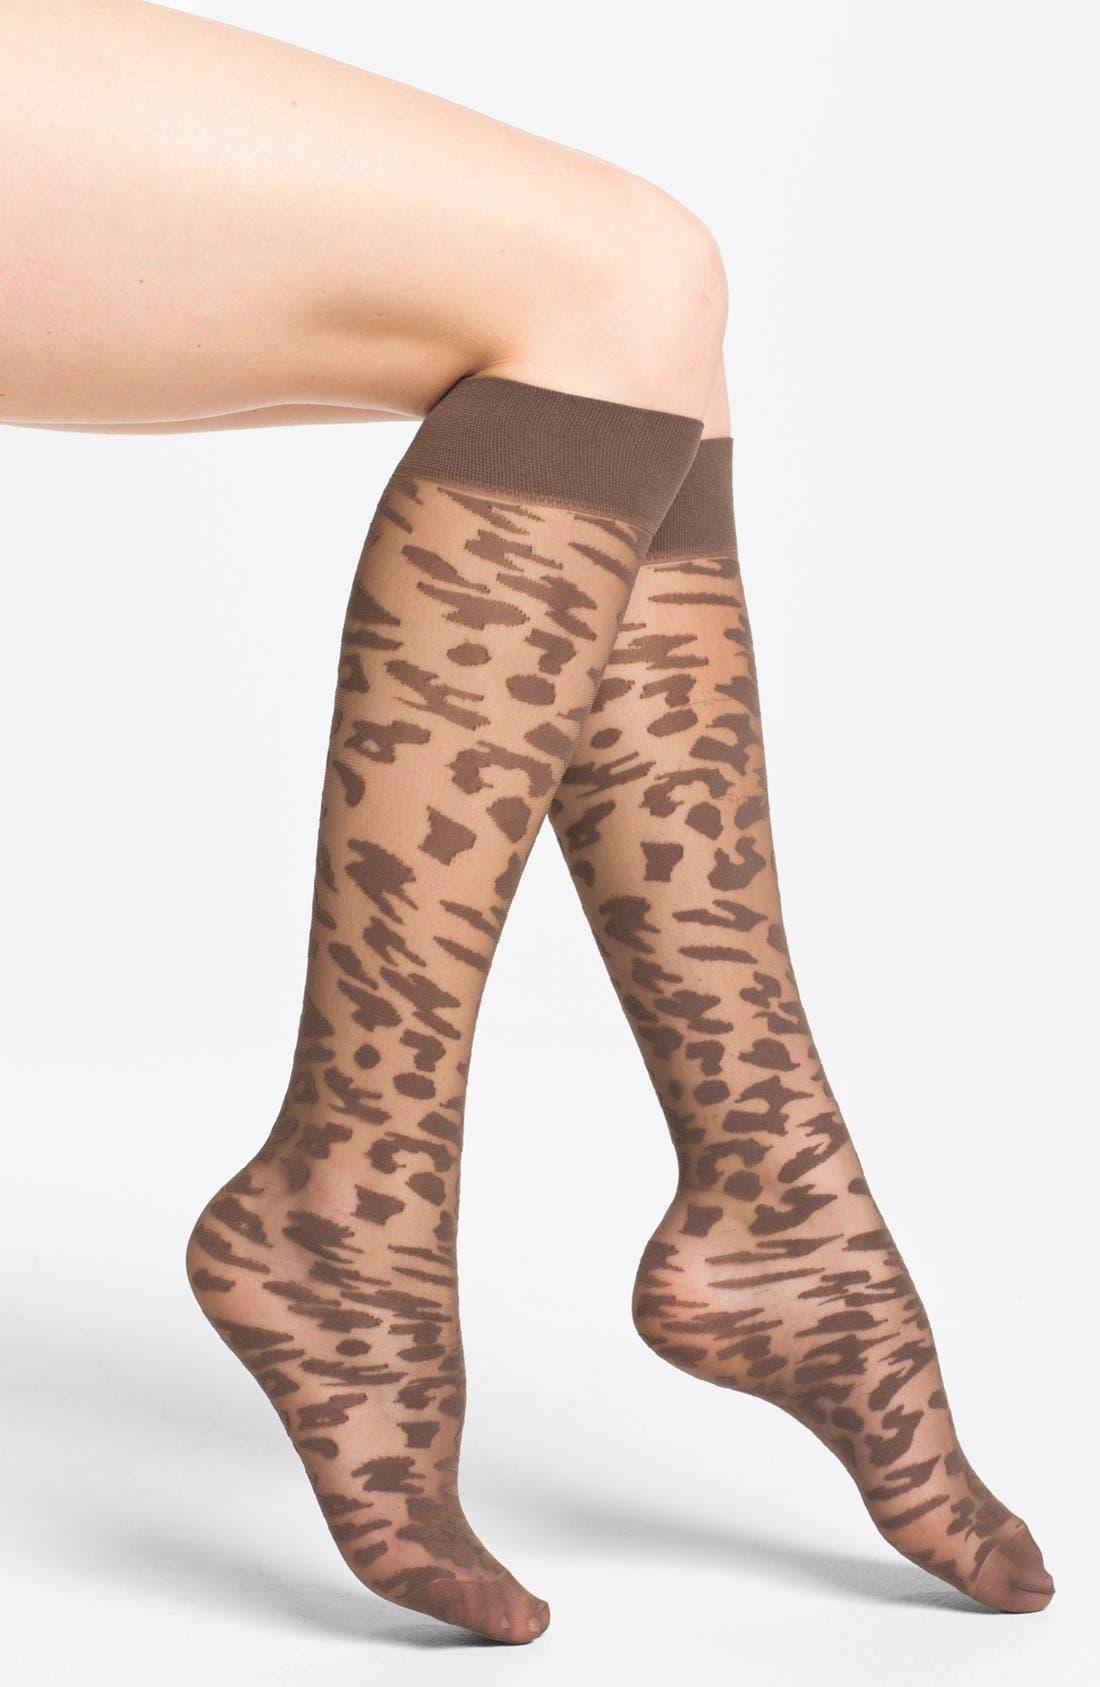 Alternate Image 1 Selected - Nordstrom 'Animal Instincts' Trouser Socks